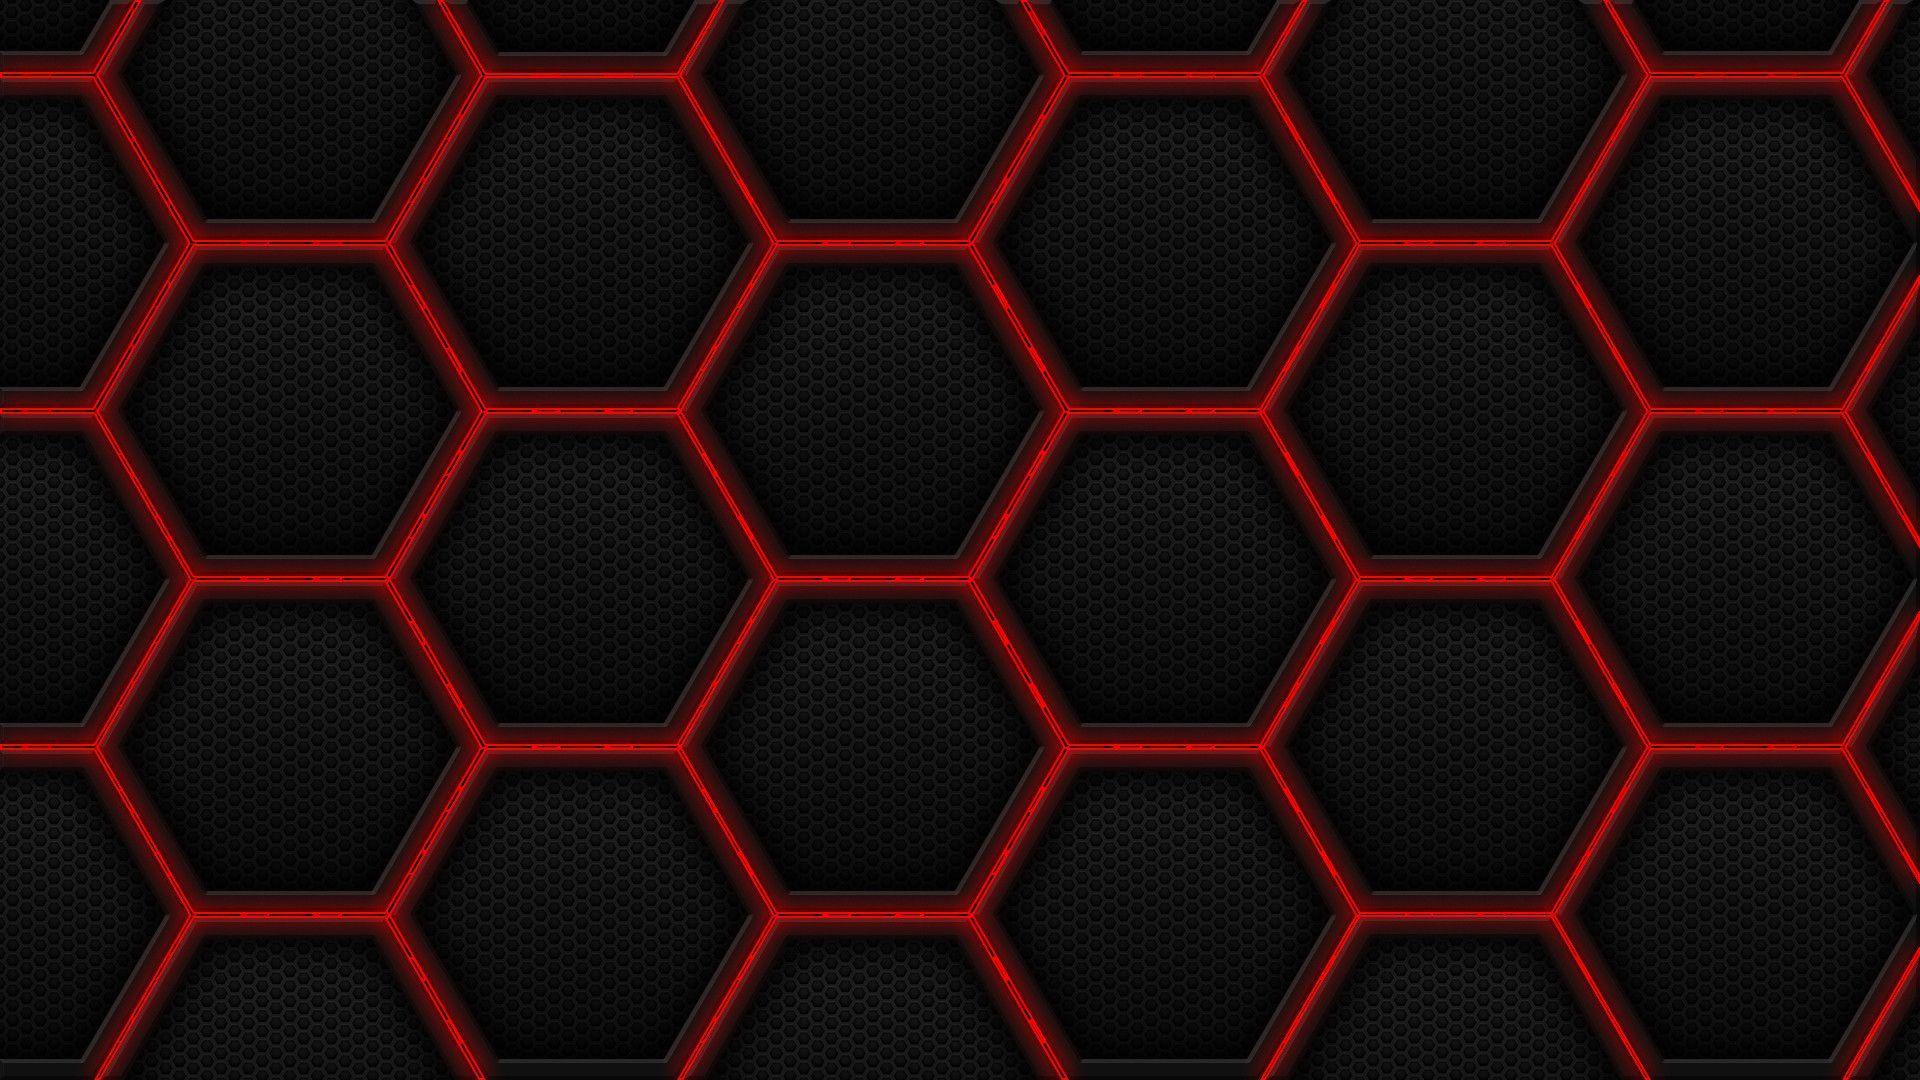 Red Hex Wallpaper 1